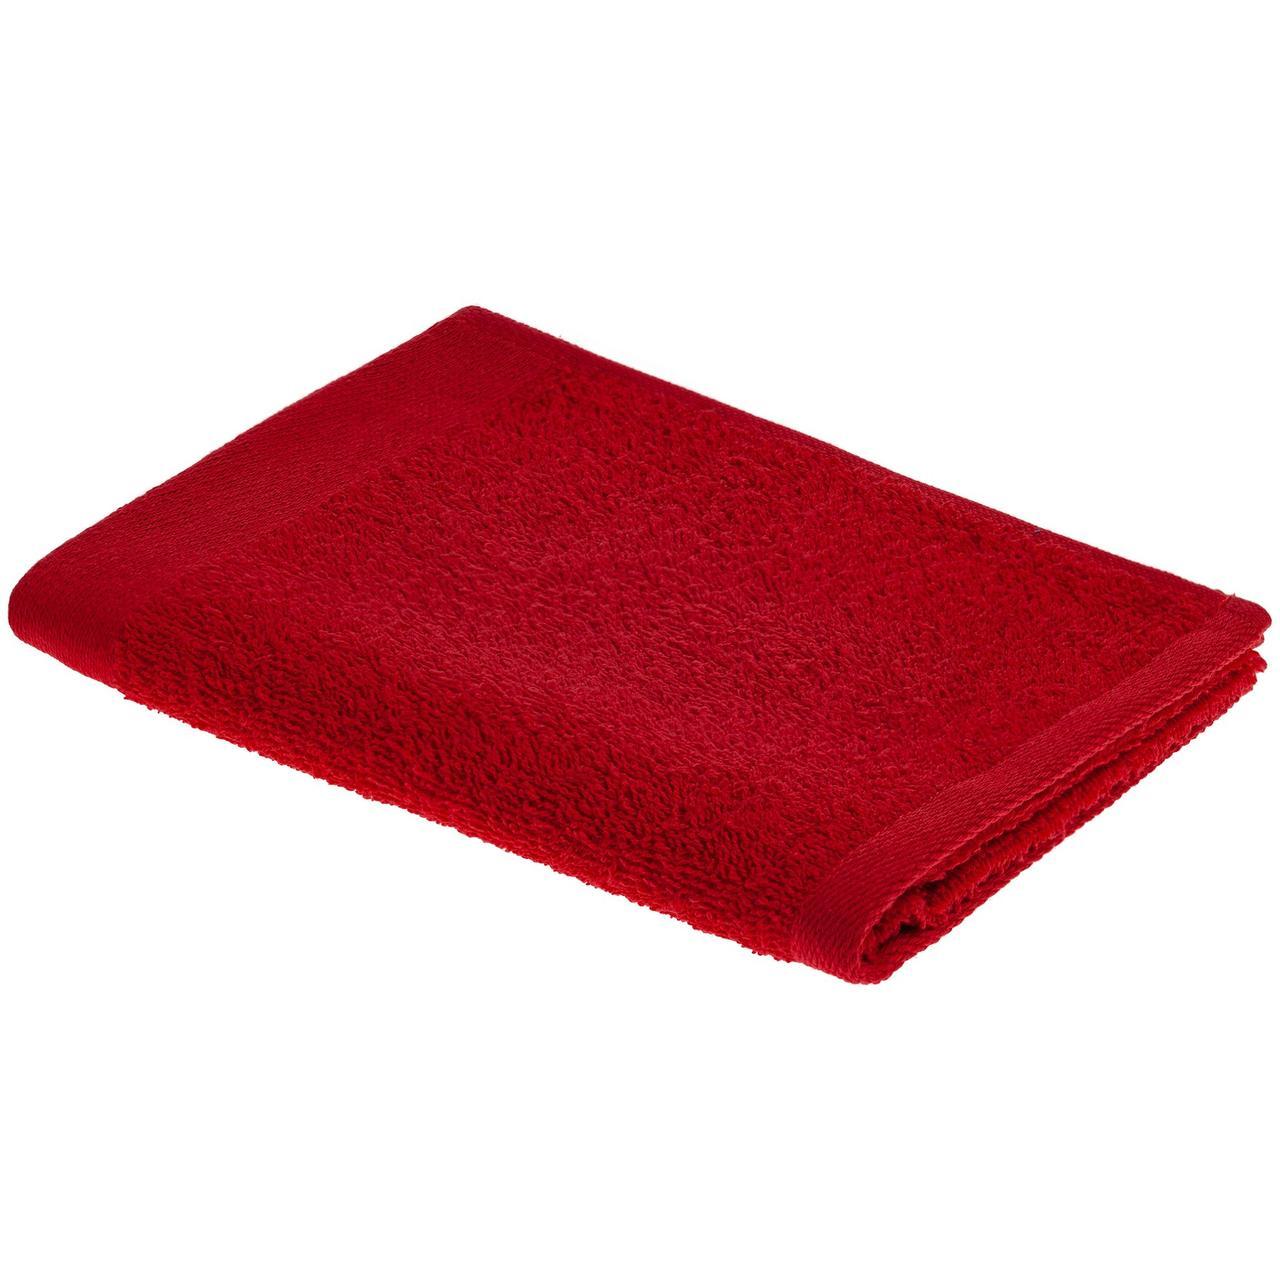 Полотенце Soft Me Light, малое, красное (артикул 15116.55)